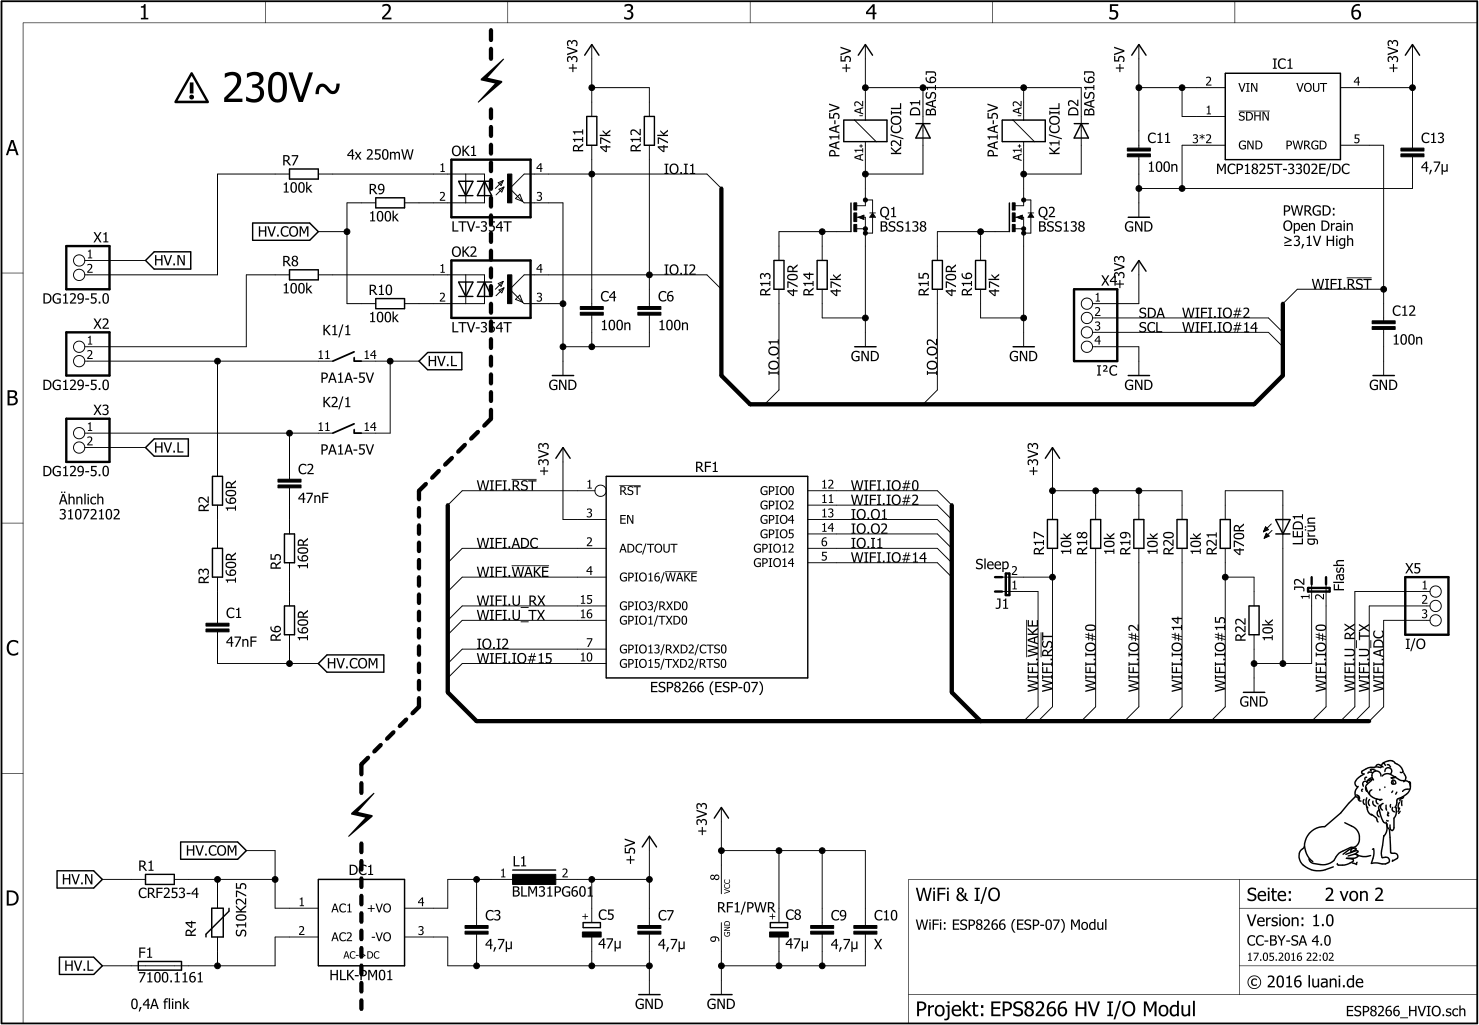 Großartig Open Source Schaltplan Capture Fotos - Der Schaltplan ...